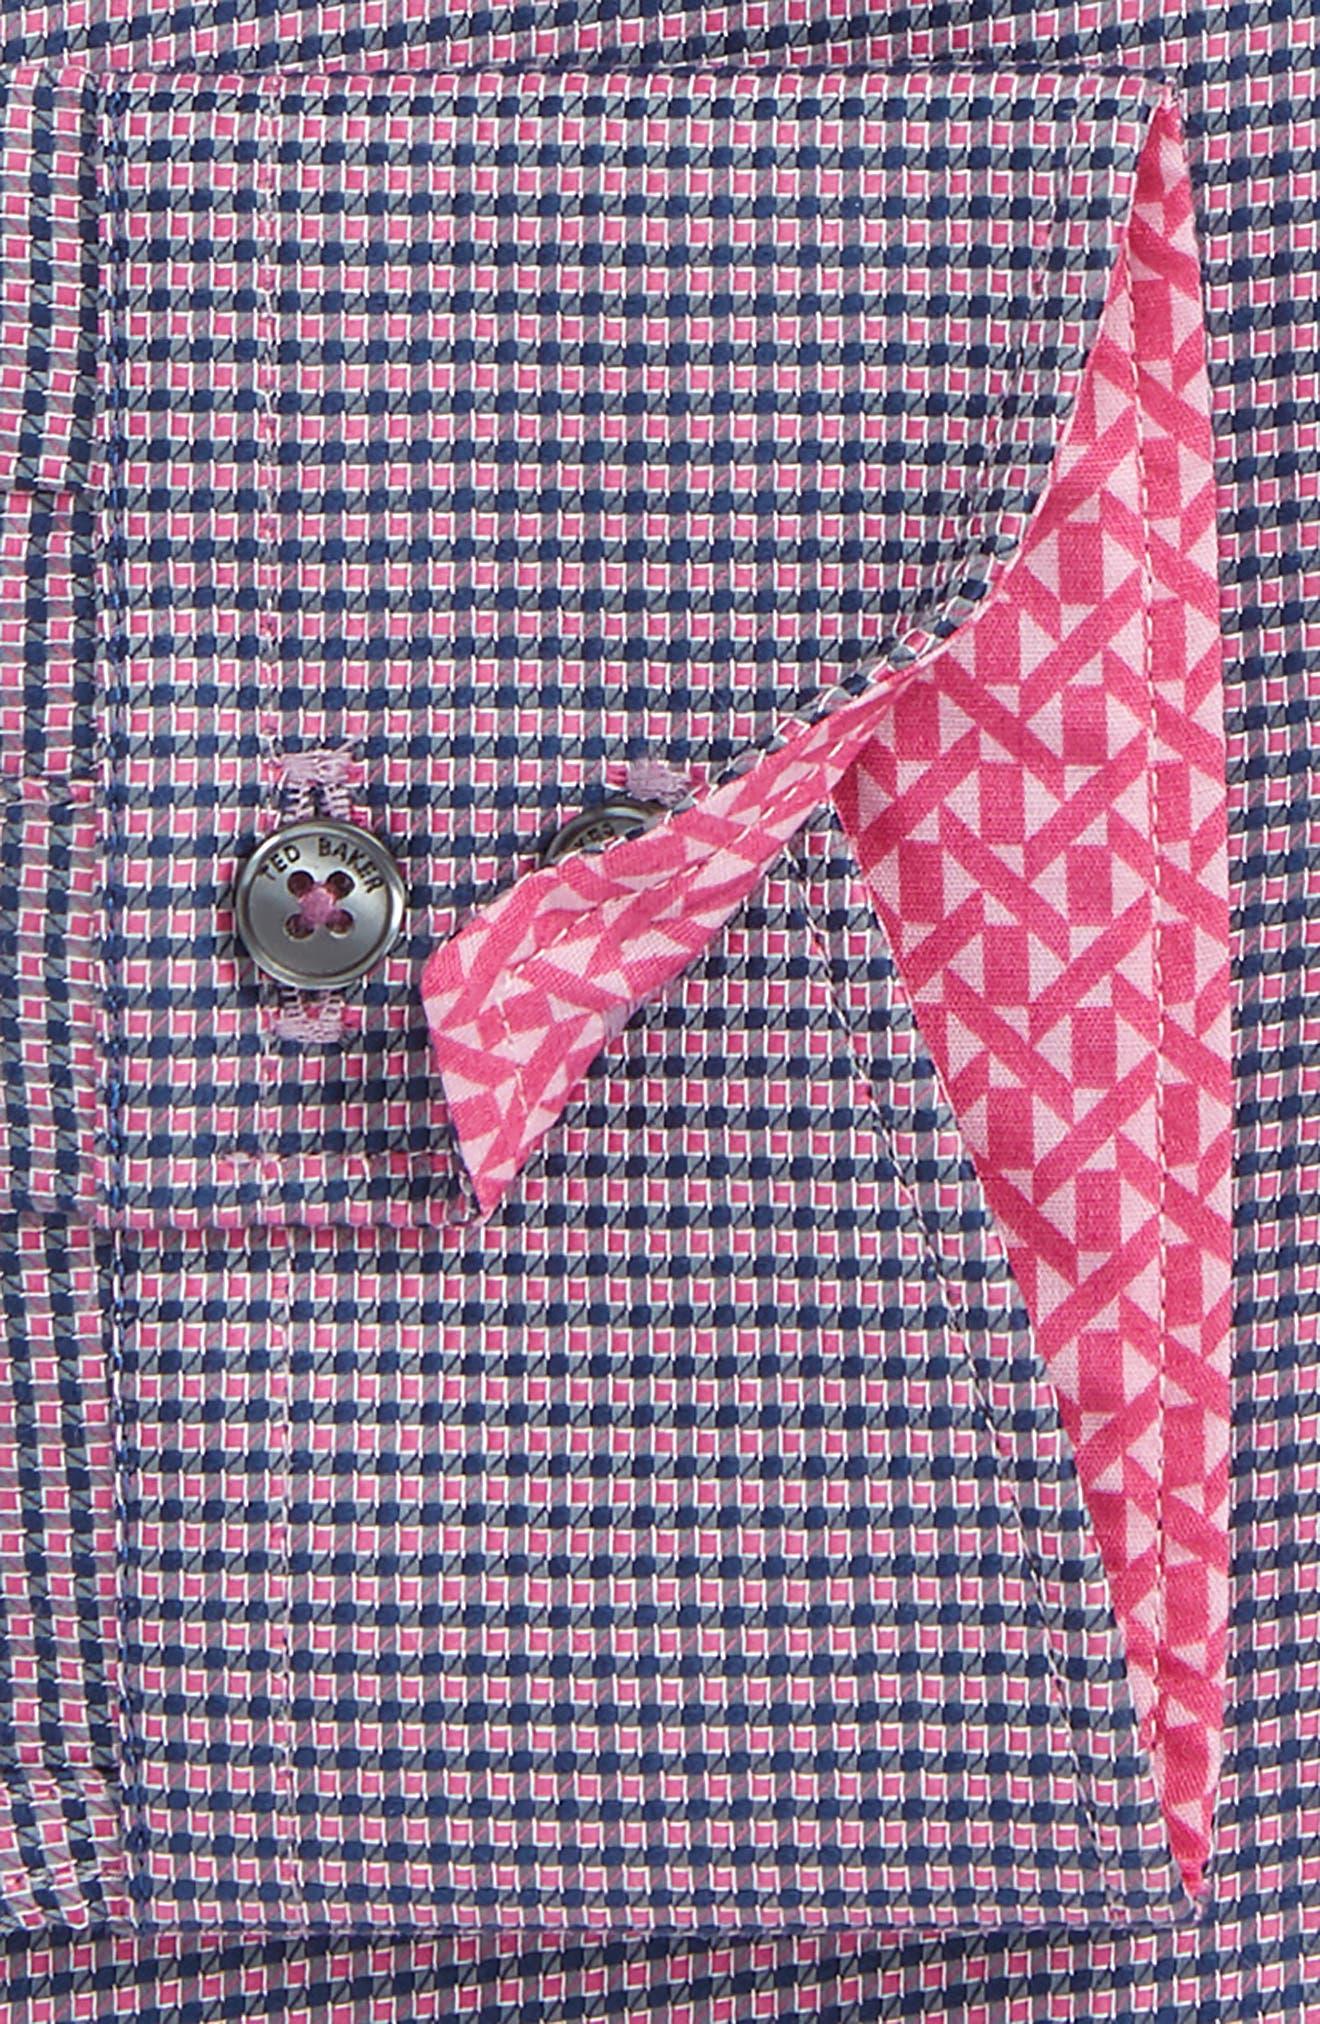 Endurance Slim Fit Box Twill Dress Shirt,                             Alternate thumbnail 2, color,                             PINK